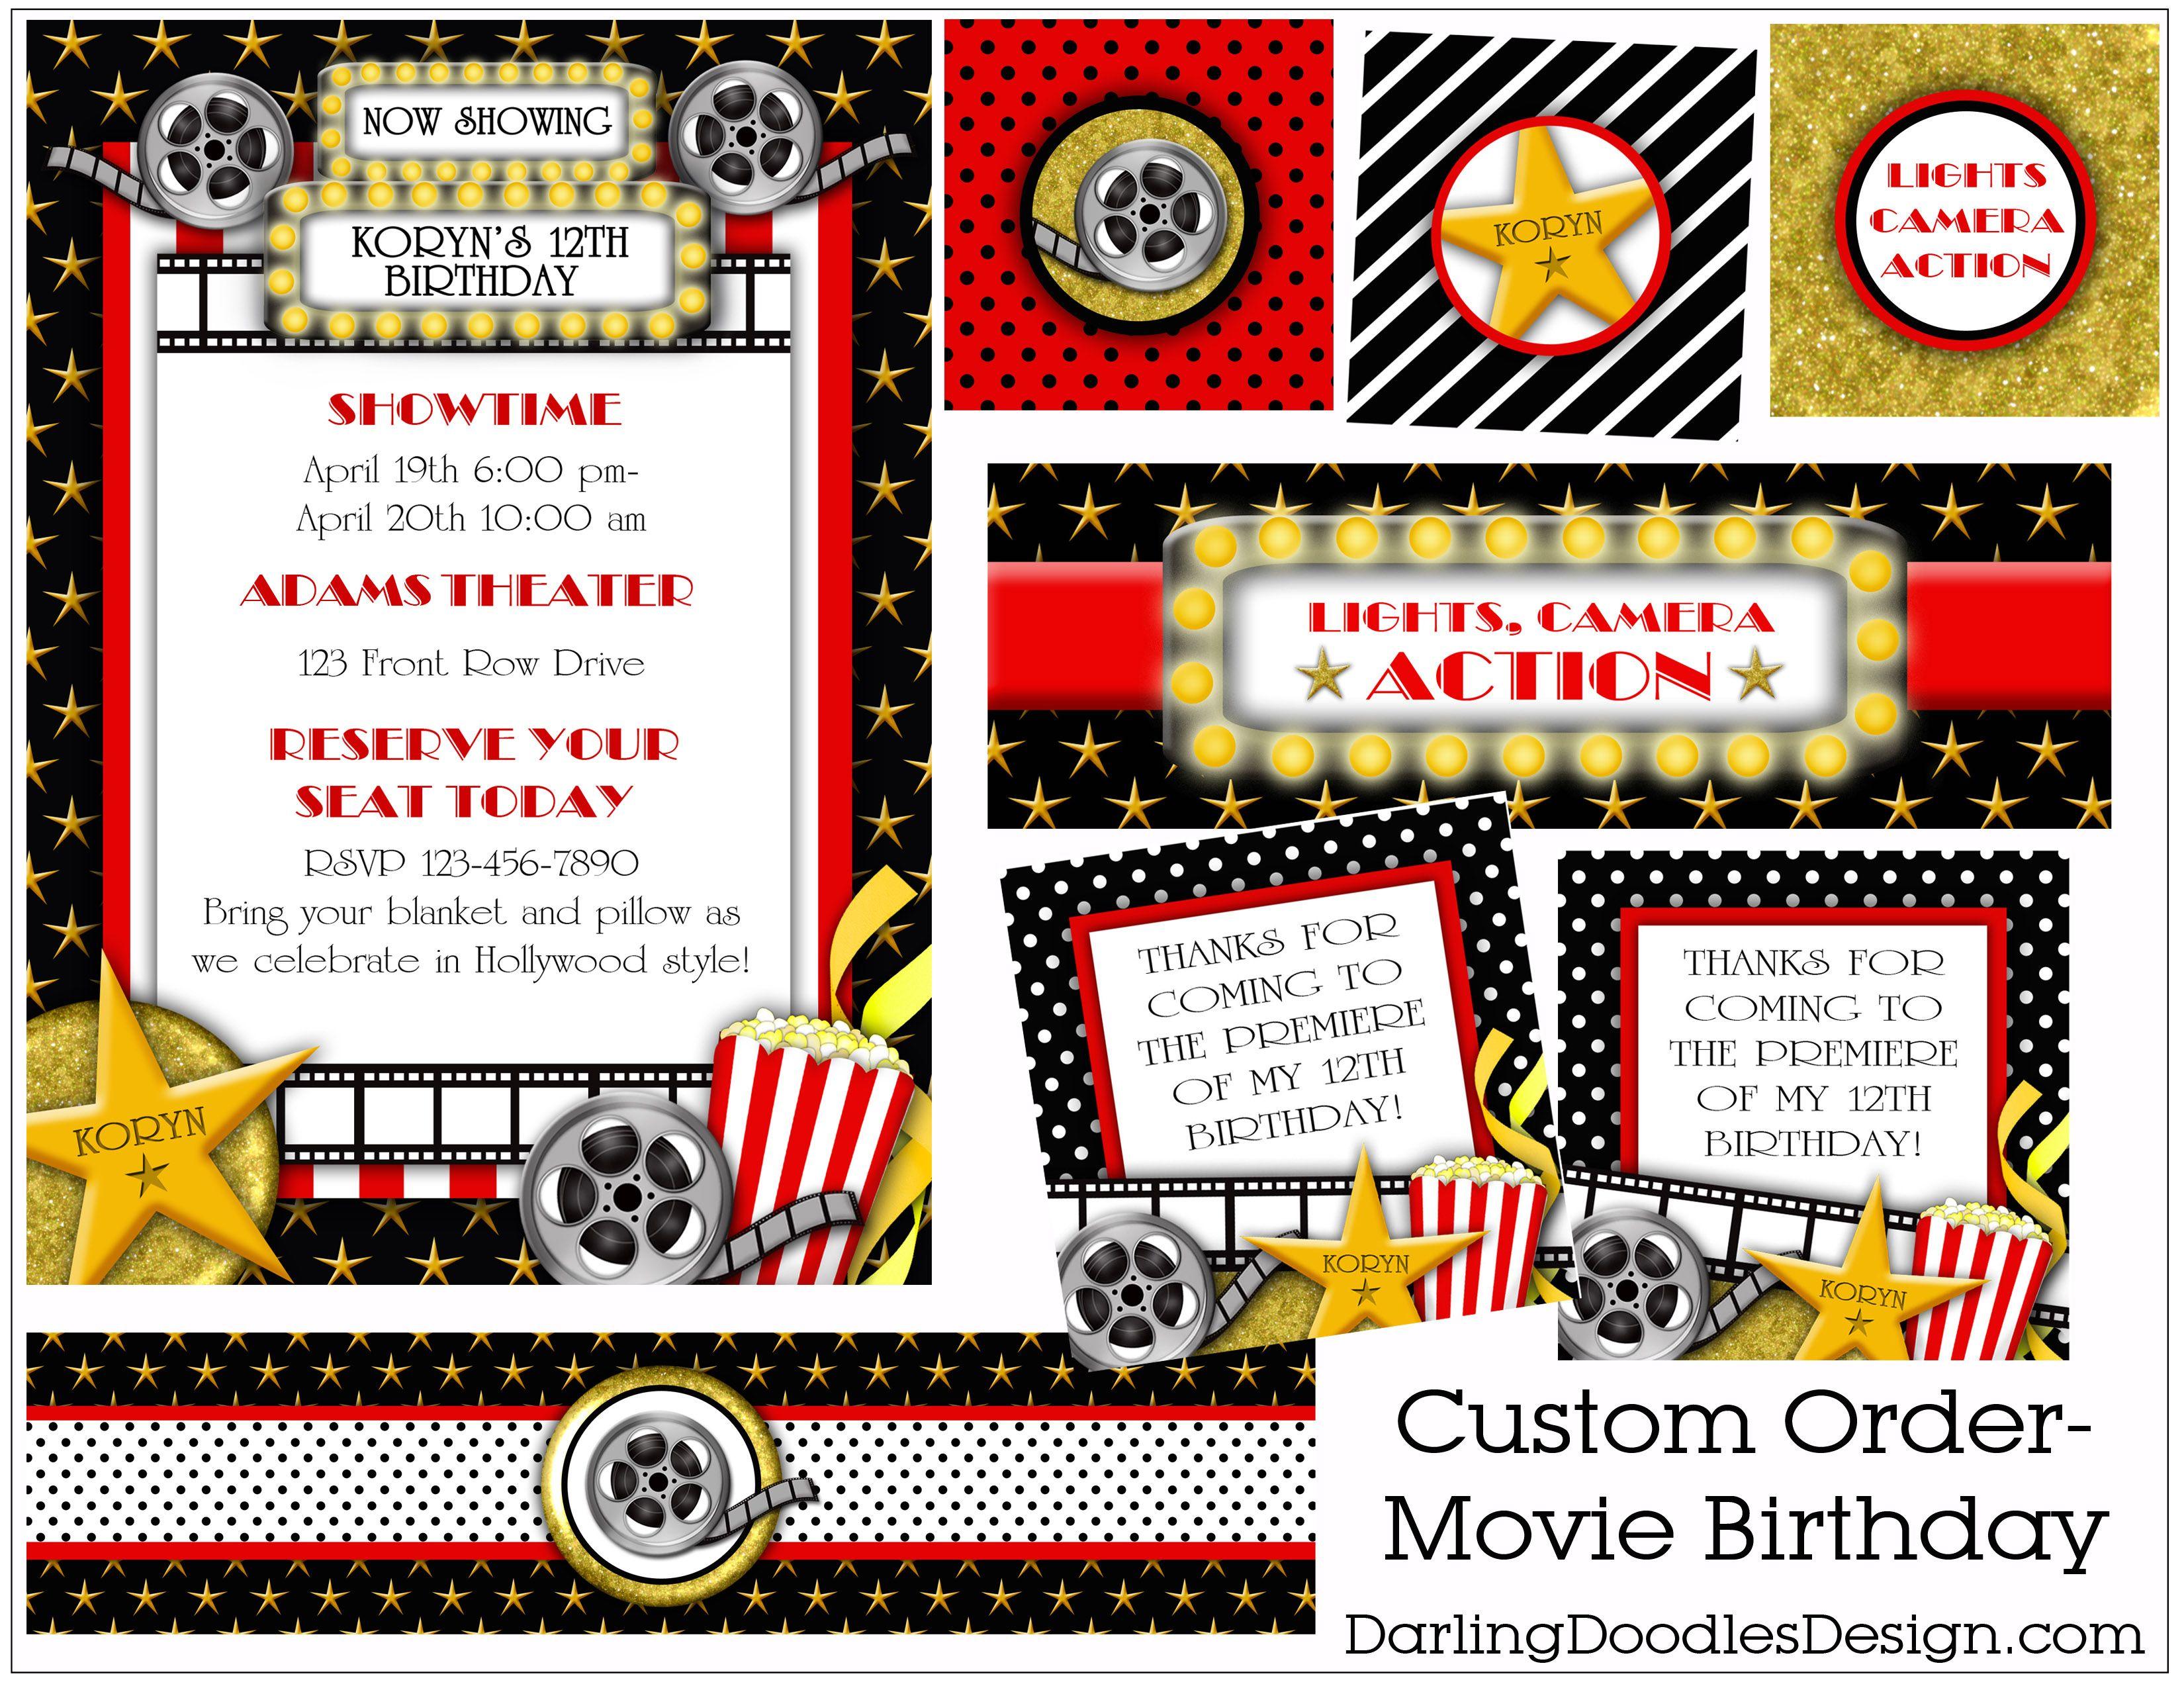 Movie Themed Party Invitations Free Lego Party Invitations ...